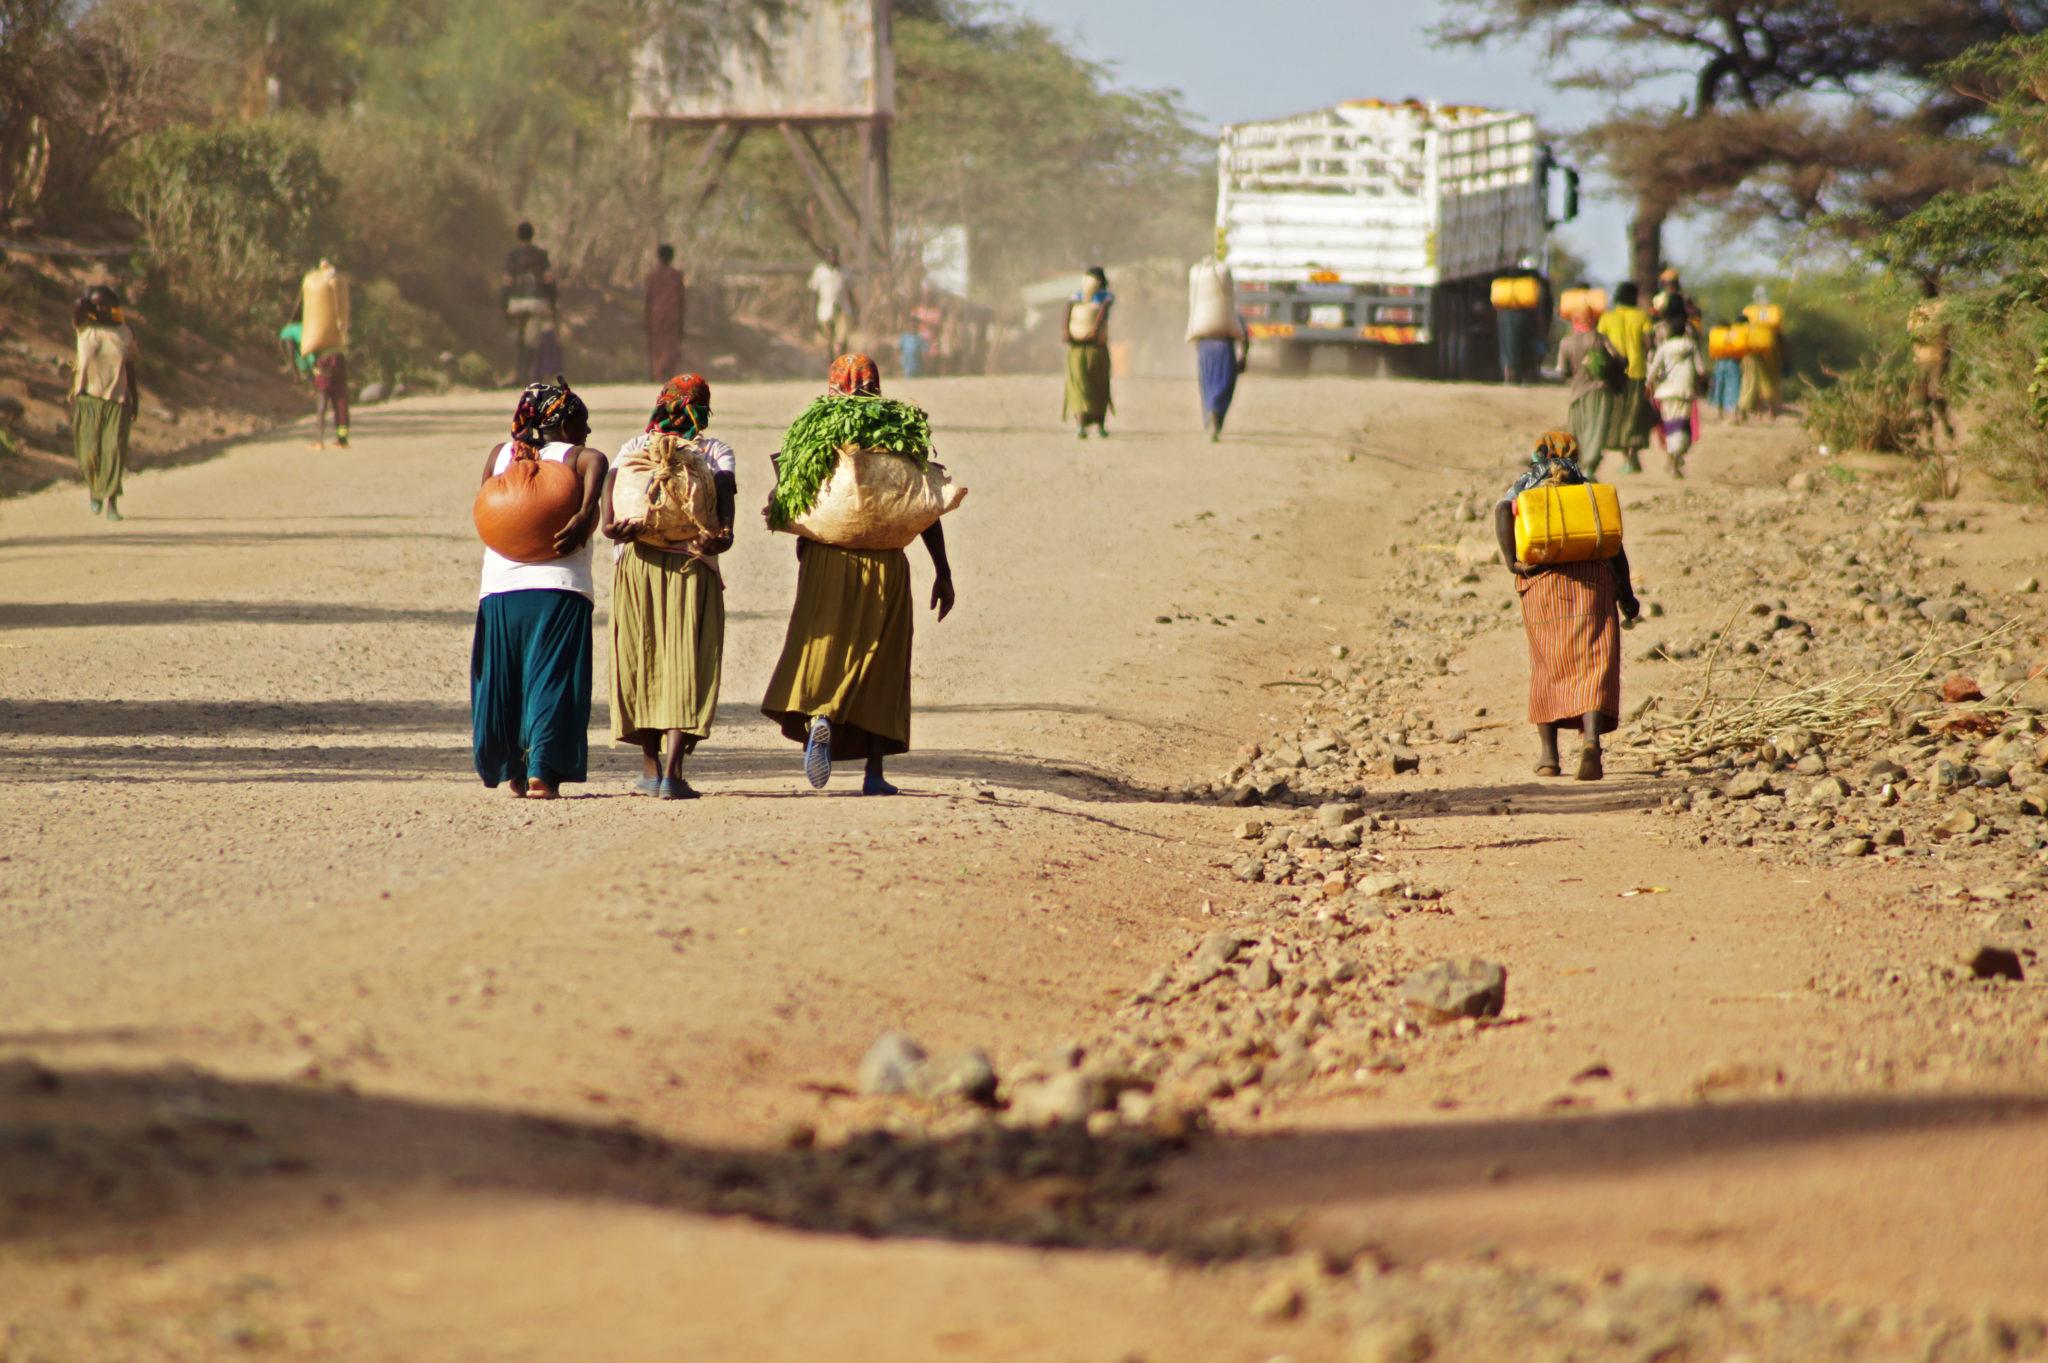 Southern-Ethiopia-Human-Zoo-Arba-Minch-Street